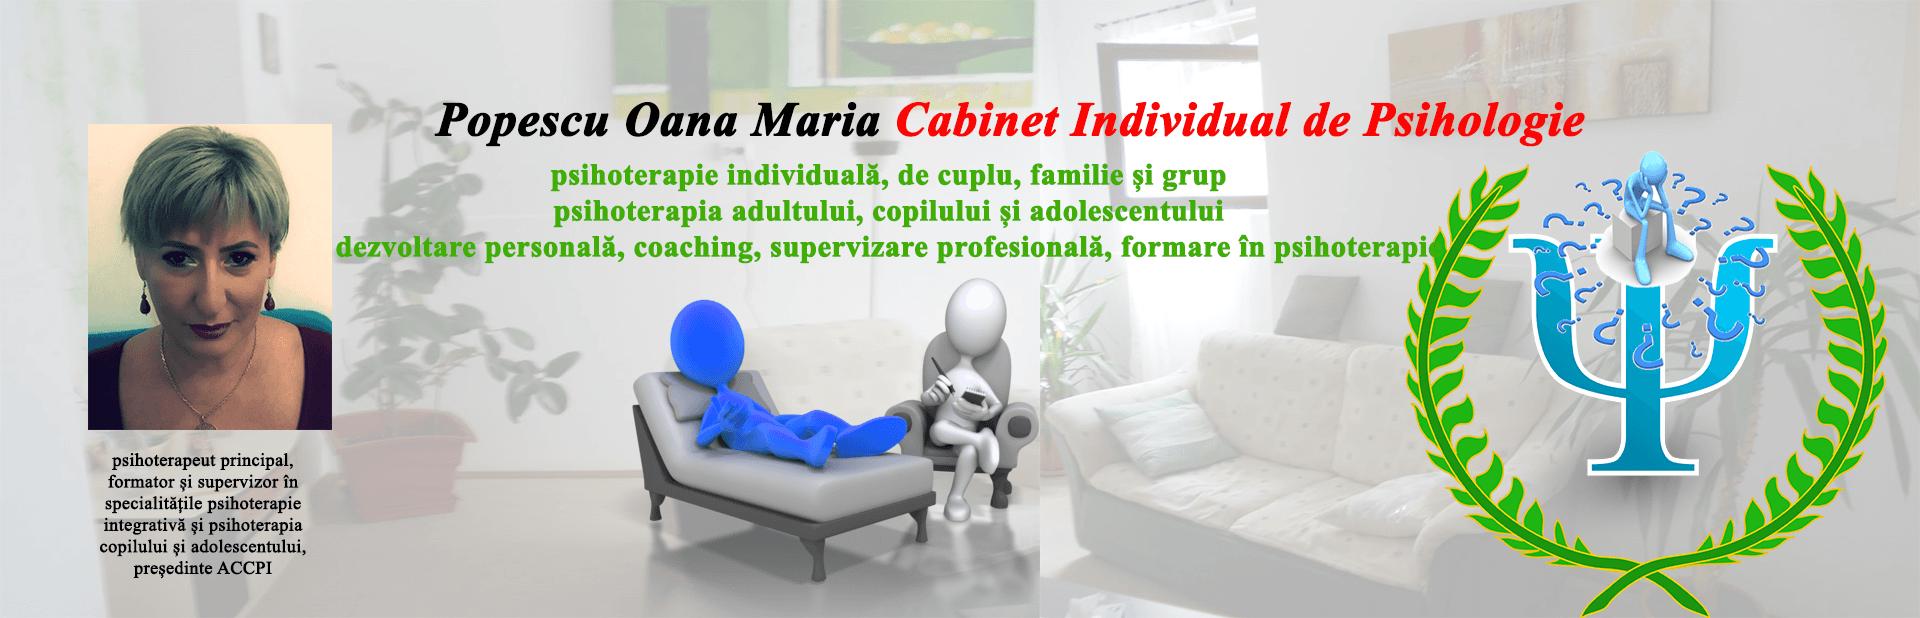 Cabinet psihoterapie si psihologie Timisoara